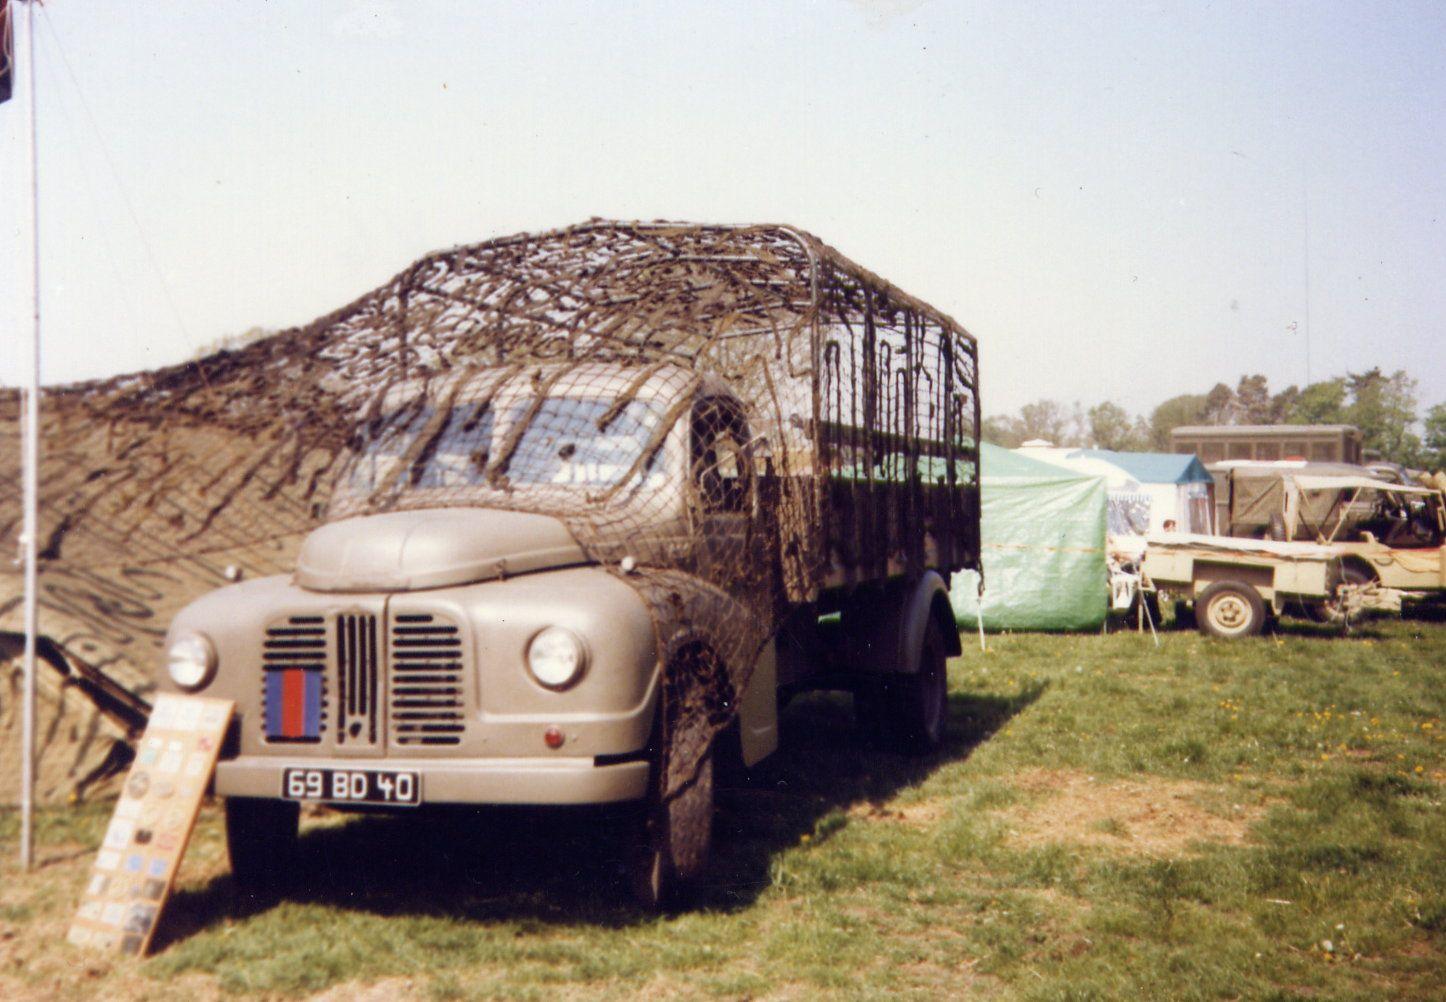 austin-k4-loadstar-3ton-4x2-cargo-69-bd-40